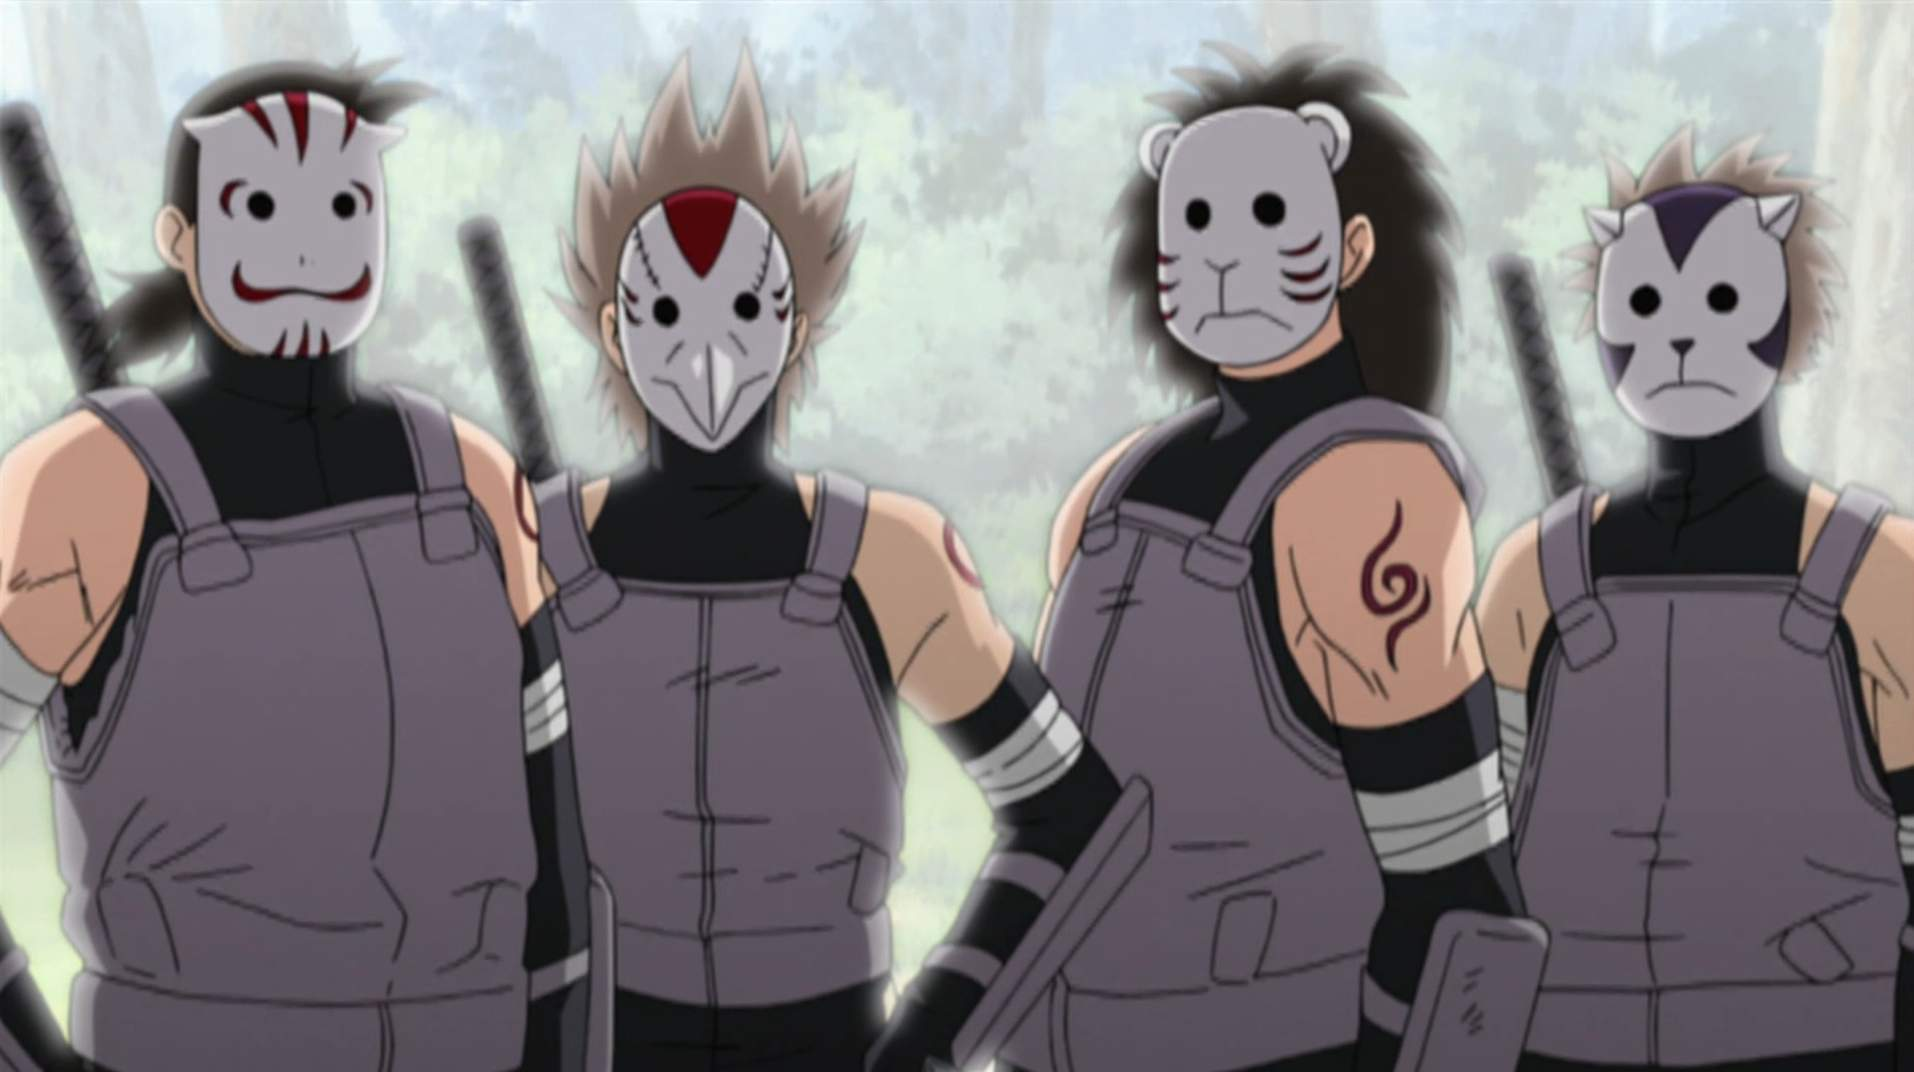 Ninja ranky (genin, chuunin, apod.) ANBU